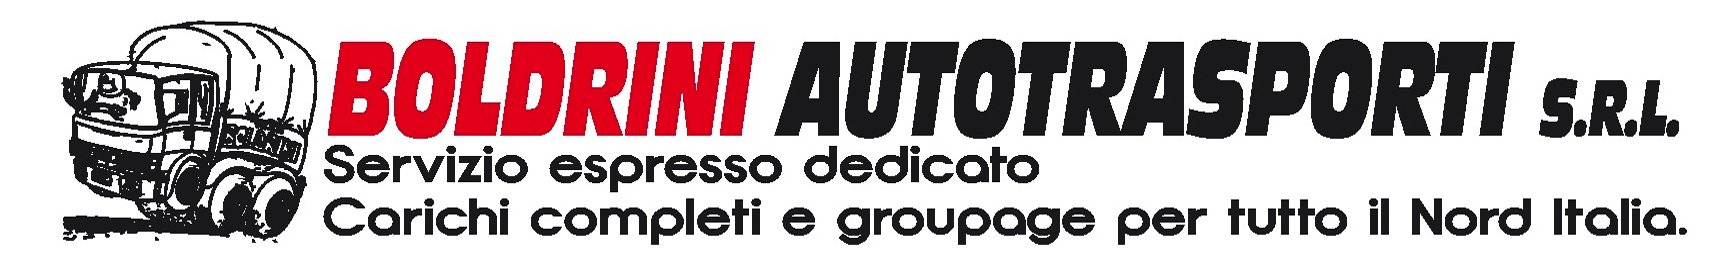 Boldrini Autotrasporti Srl logo